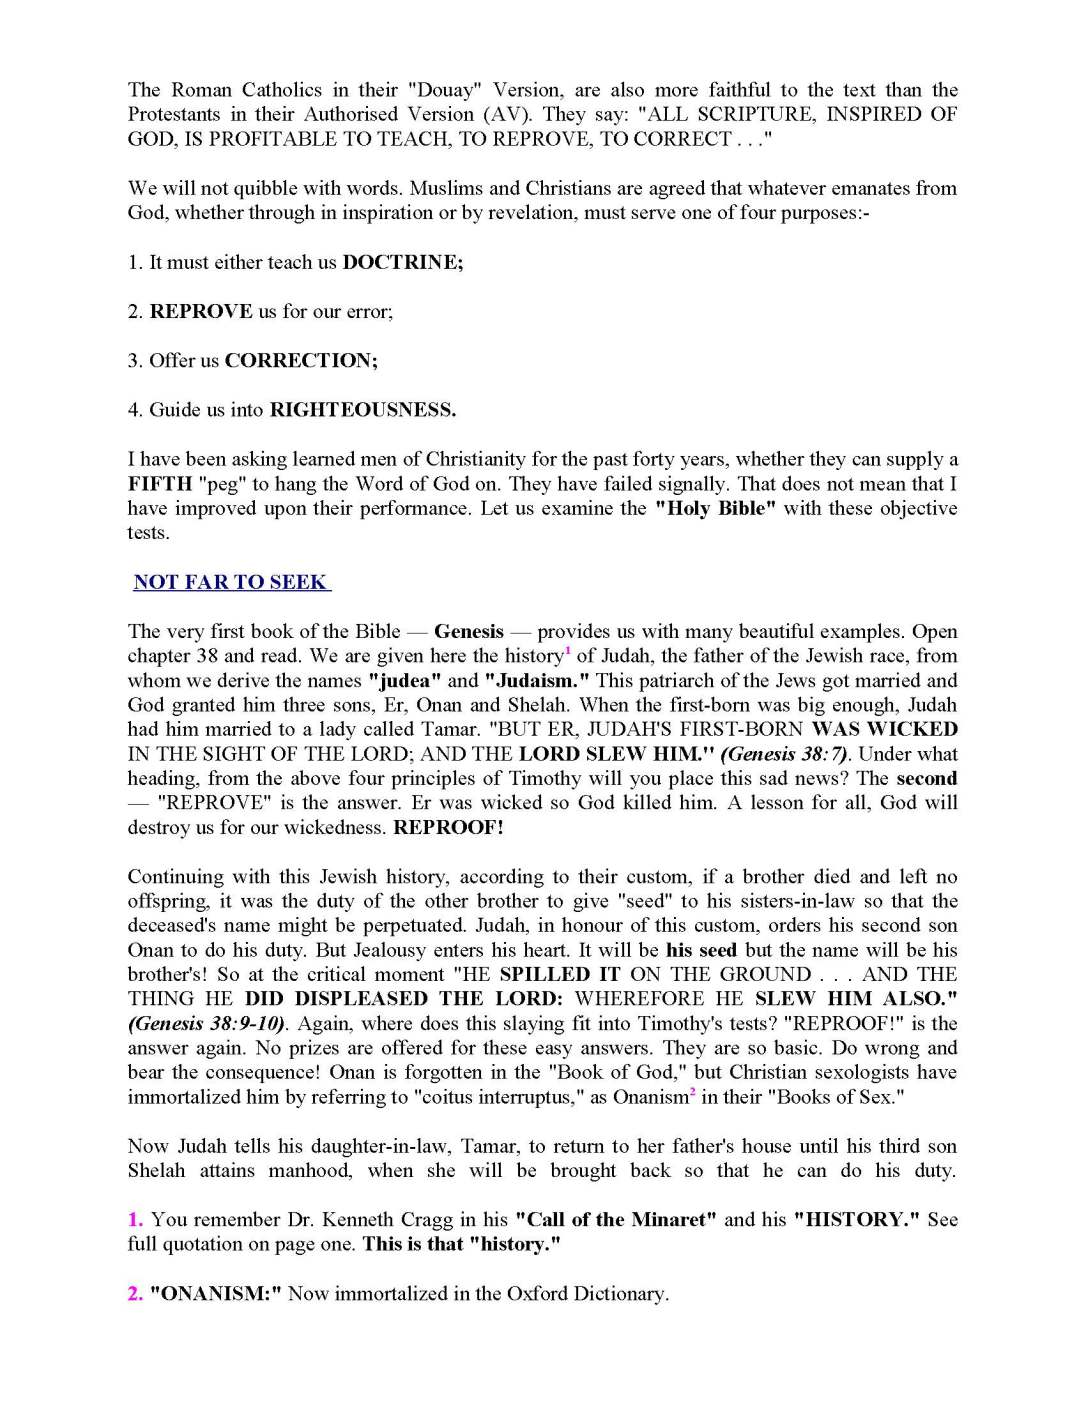 Is The Bible Gods Word [deedat]_Page_34